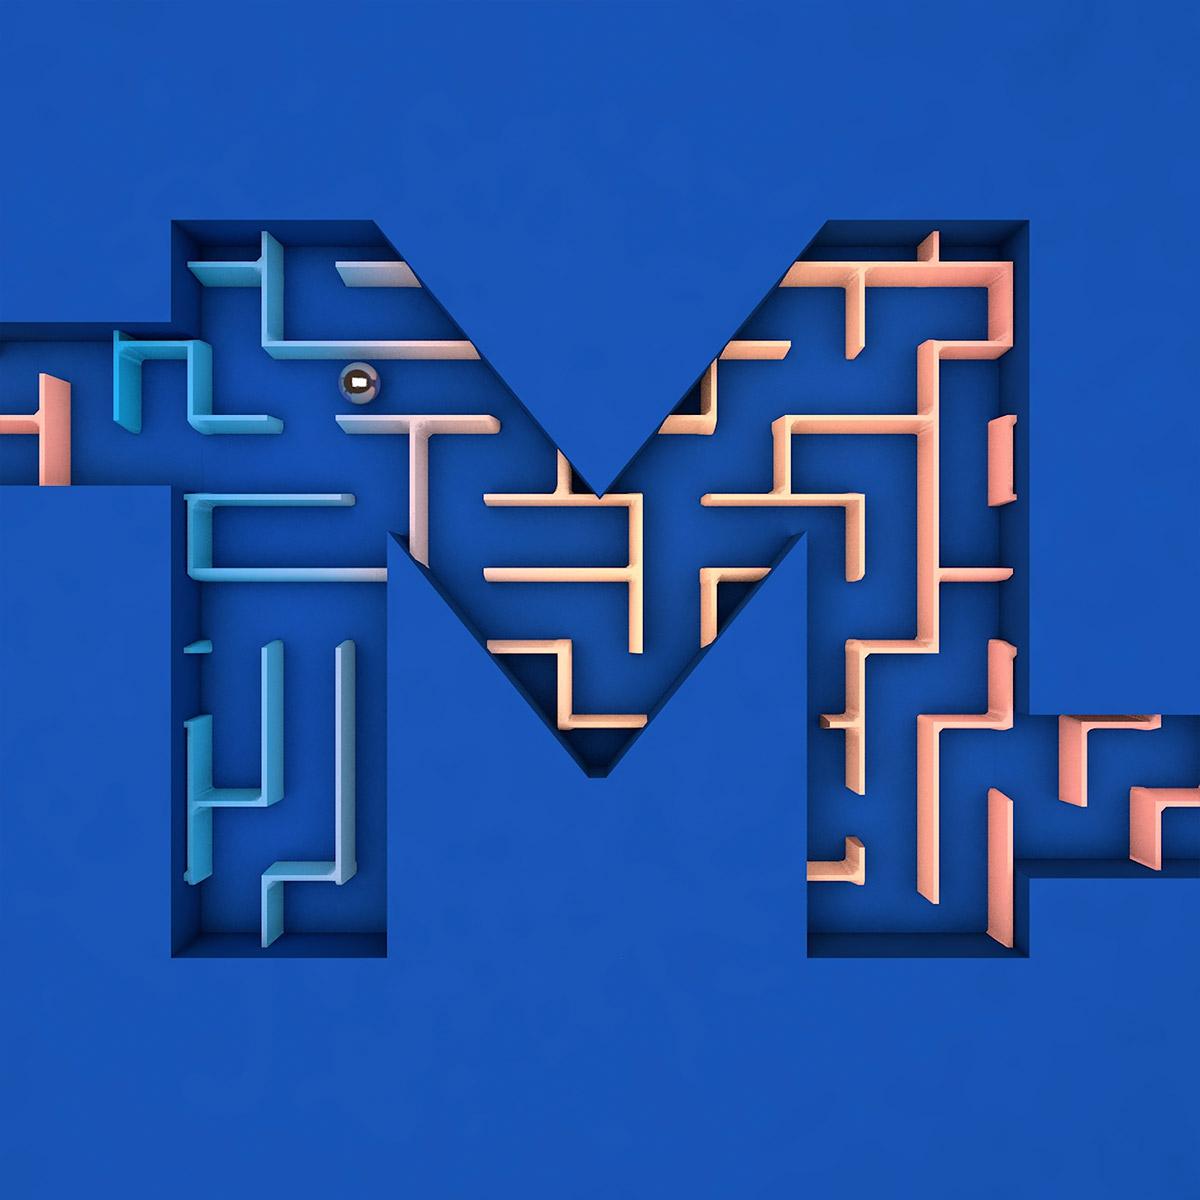 Creative Typography by Anna Zinovieva